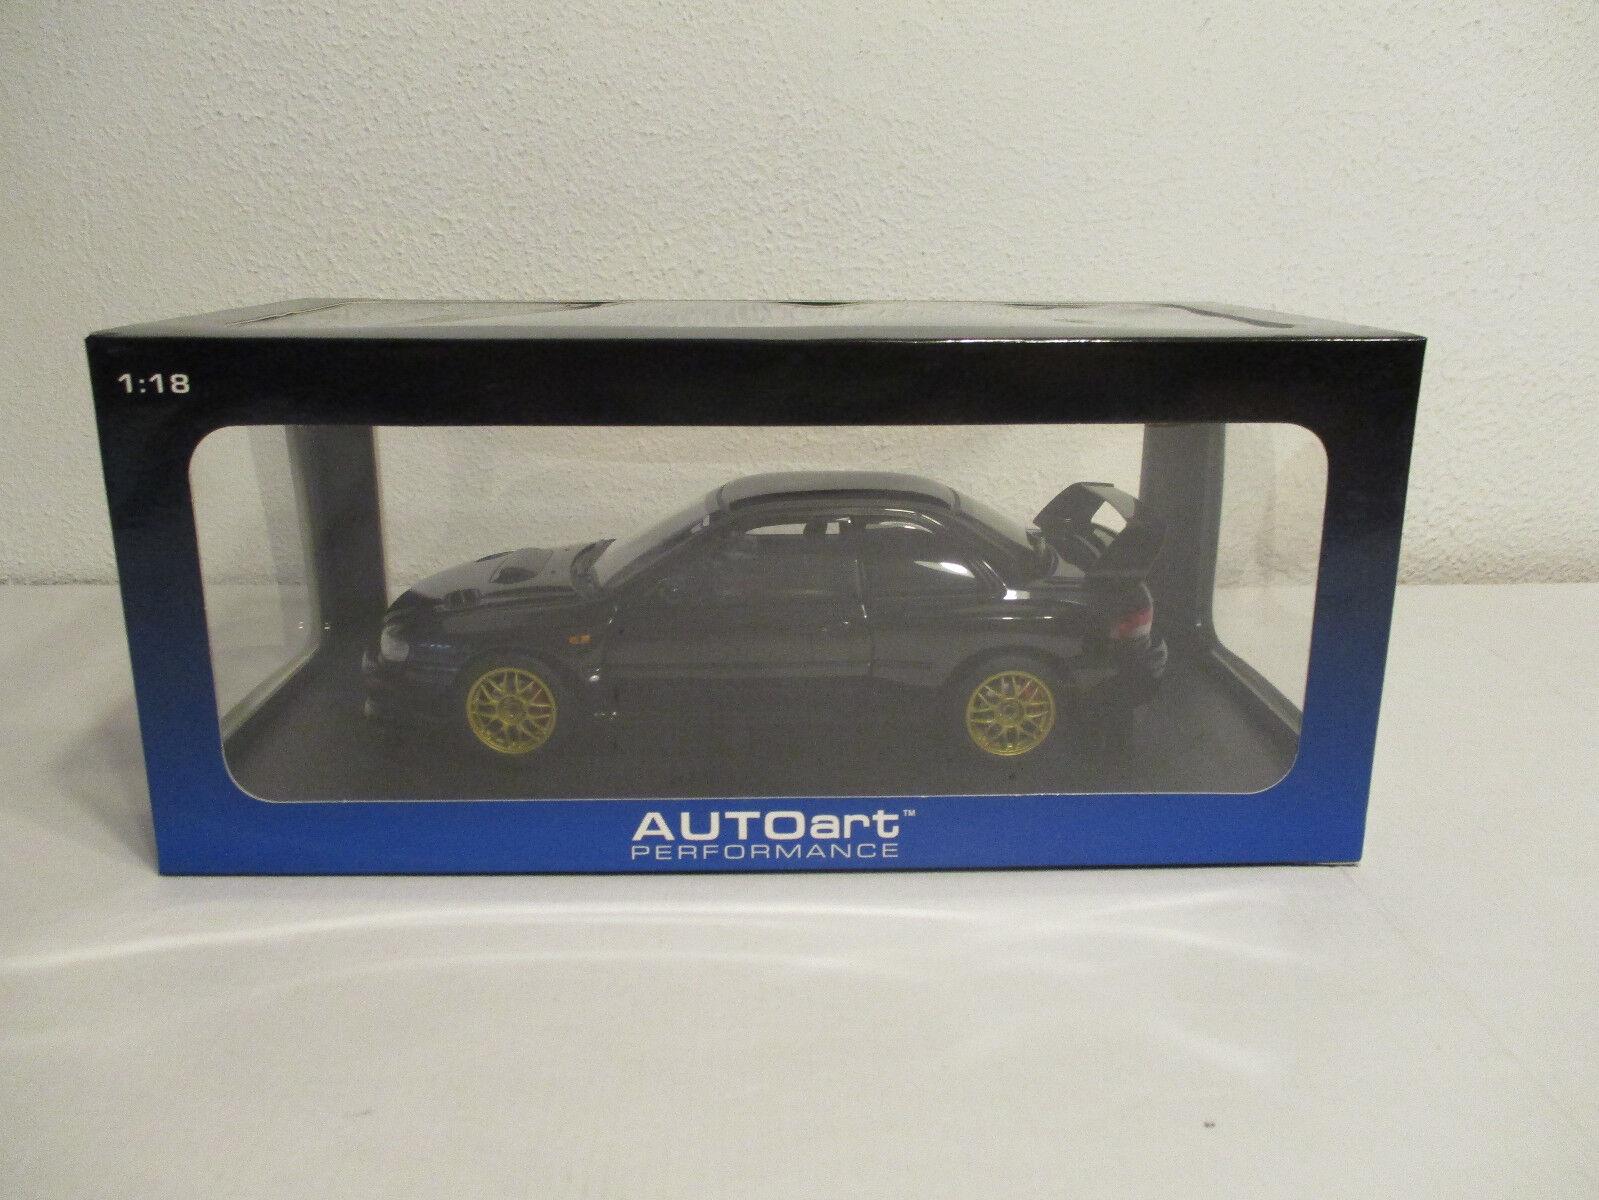 (Modelage) 1 18 Autoart Subaru impreza 22b sti Nouveau neuf dans sa boîte